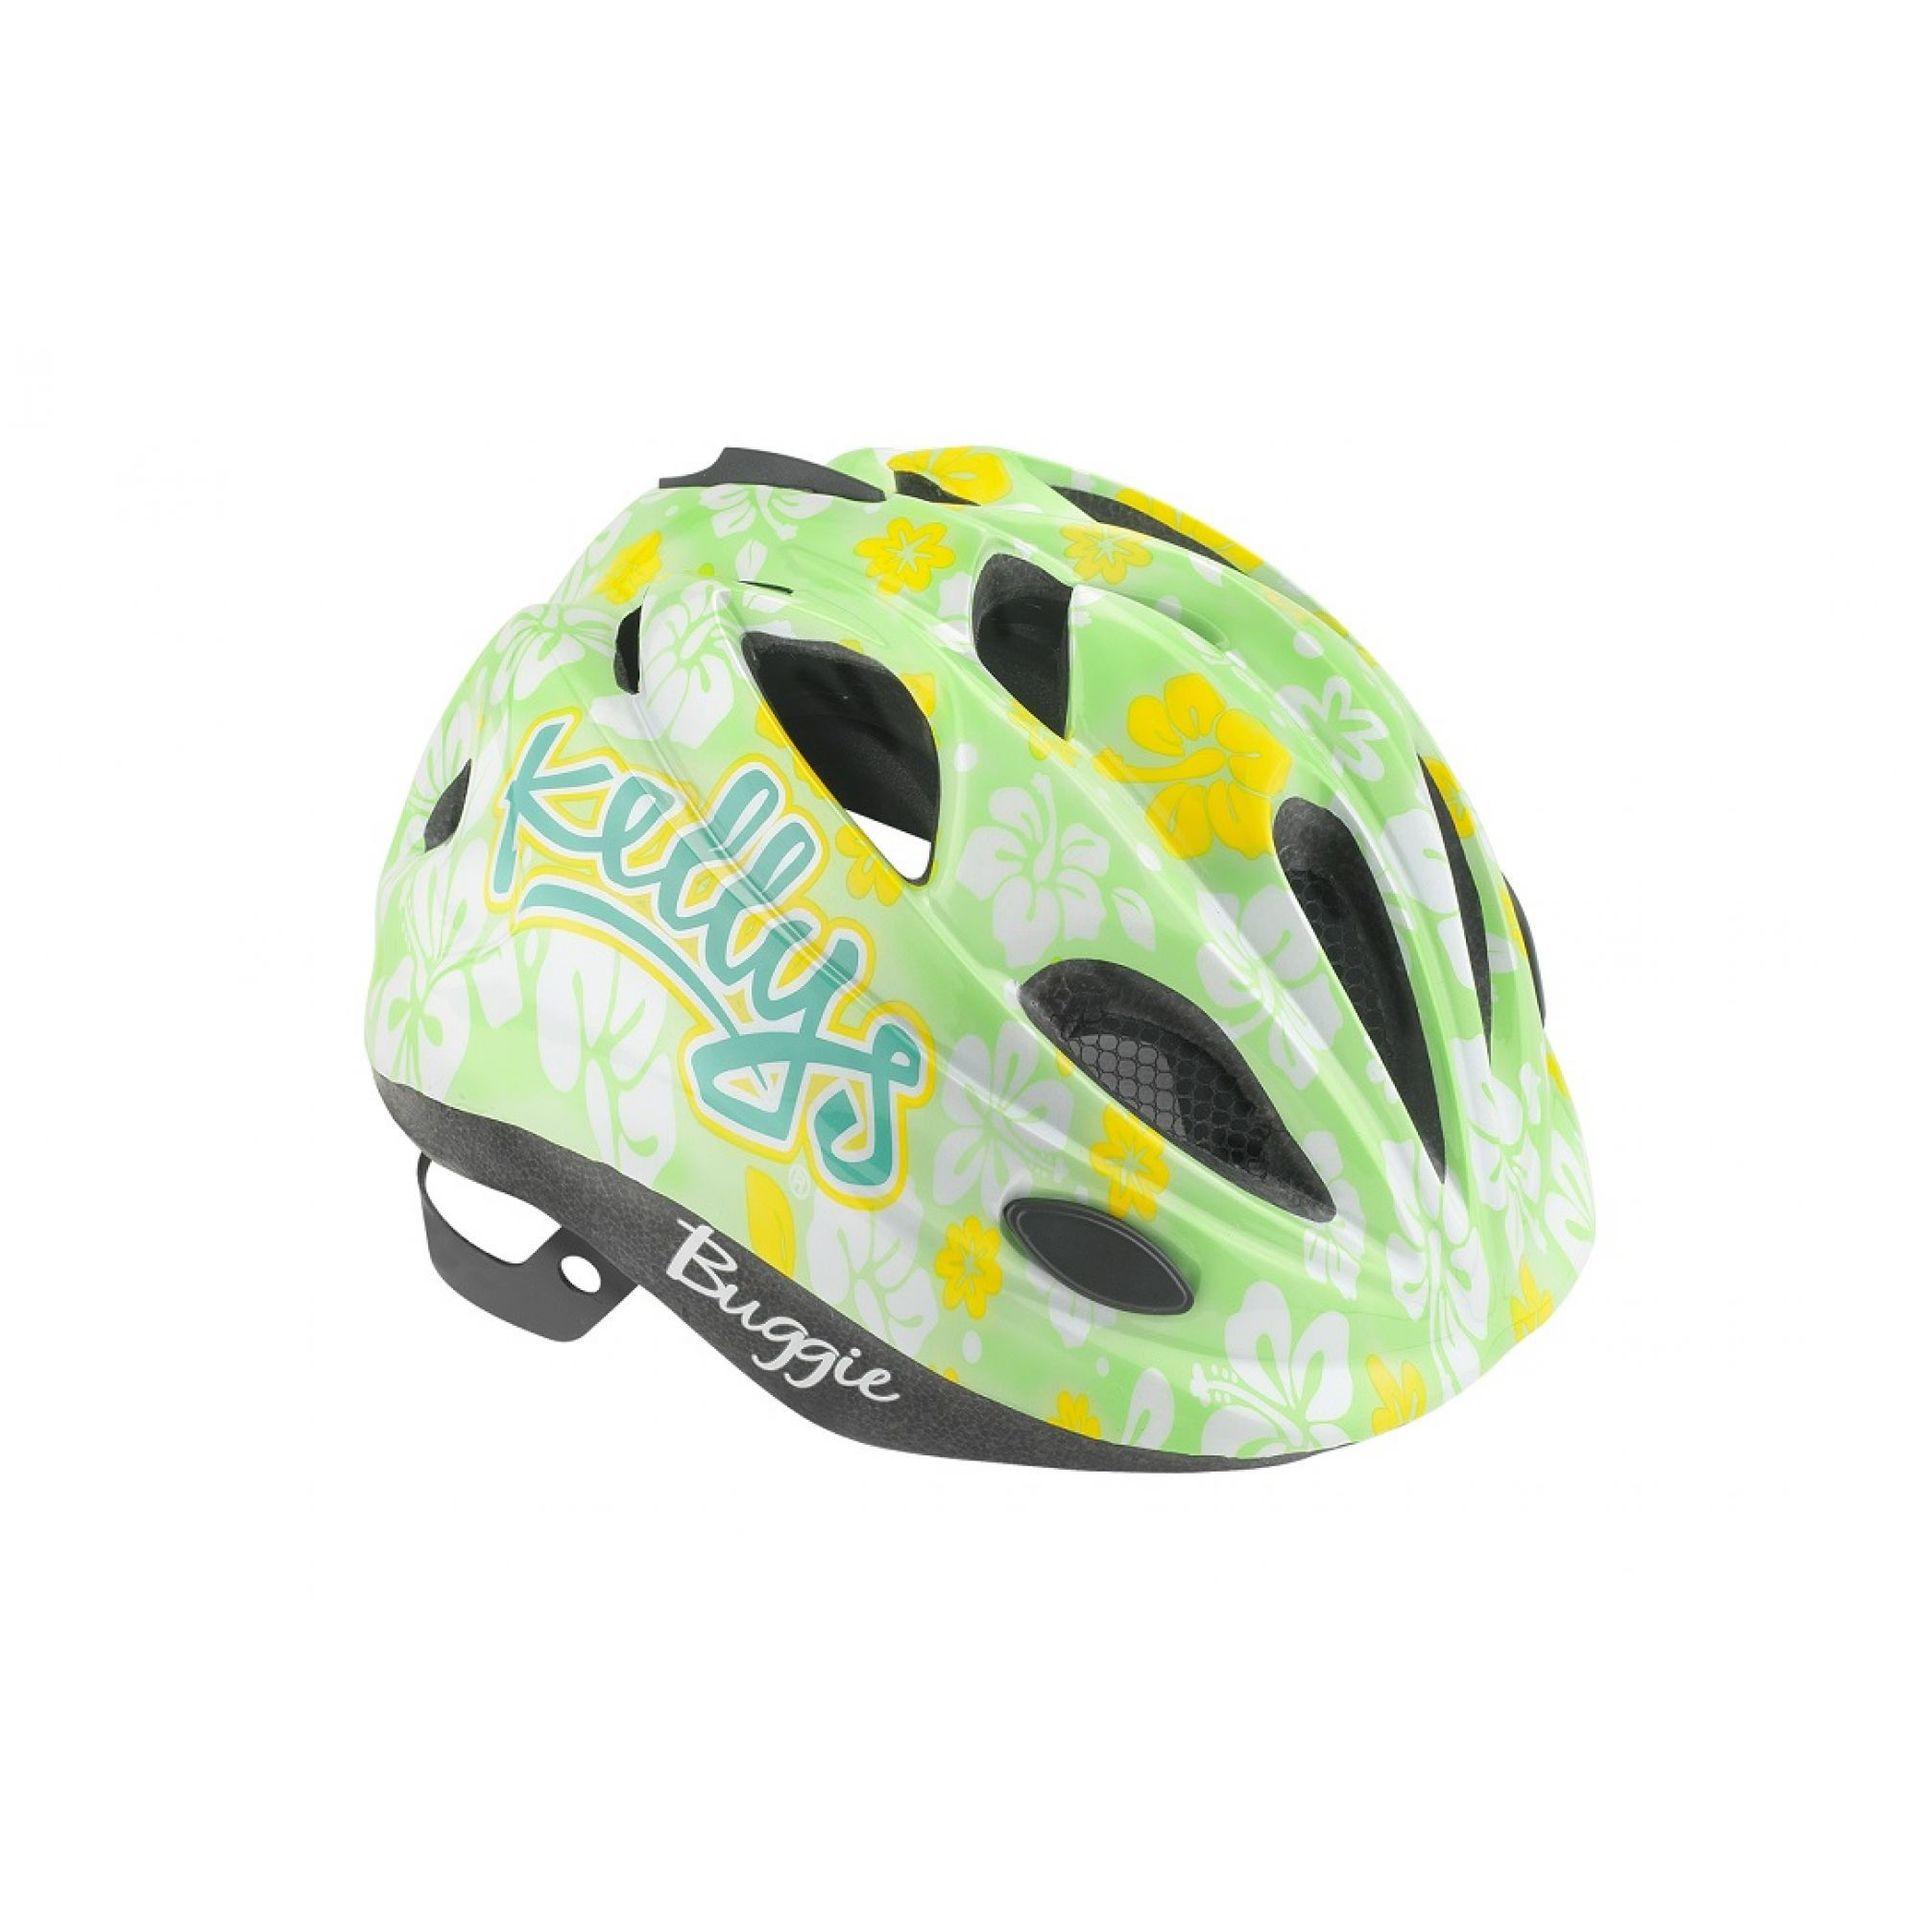 Kask rowerowy Kellys Buggie zielony